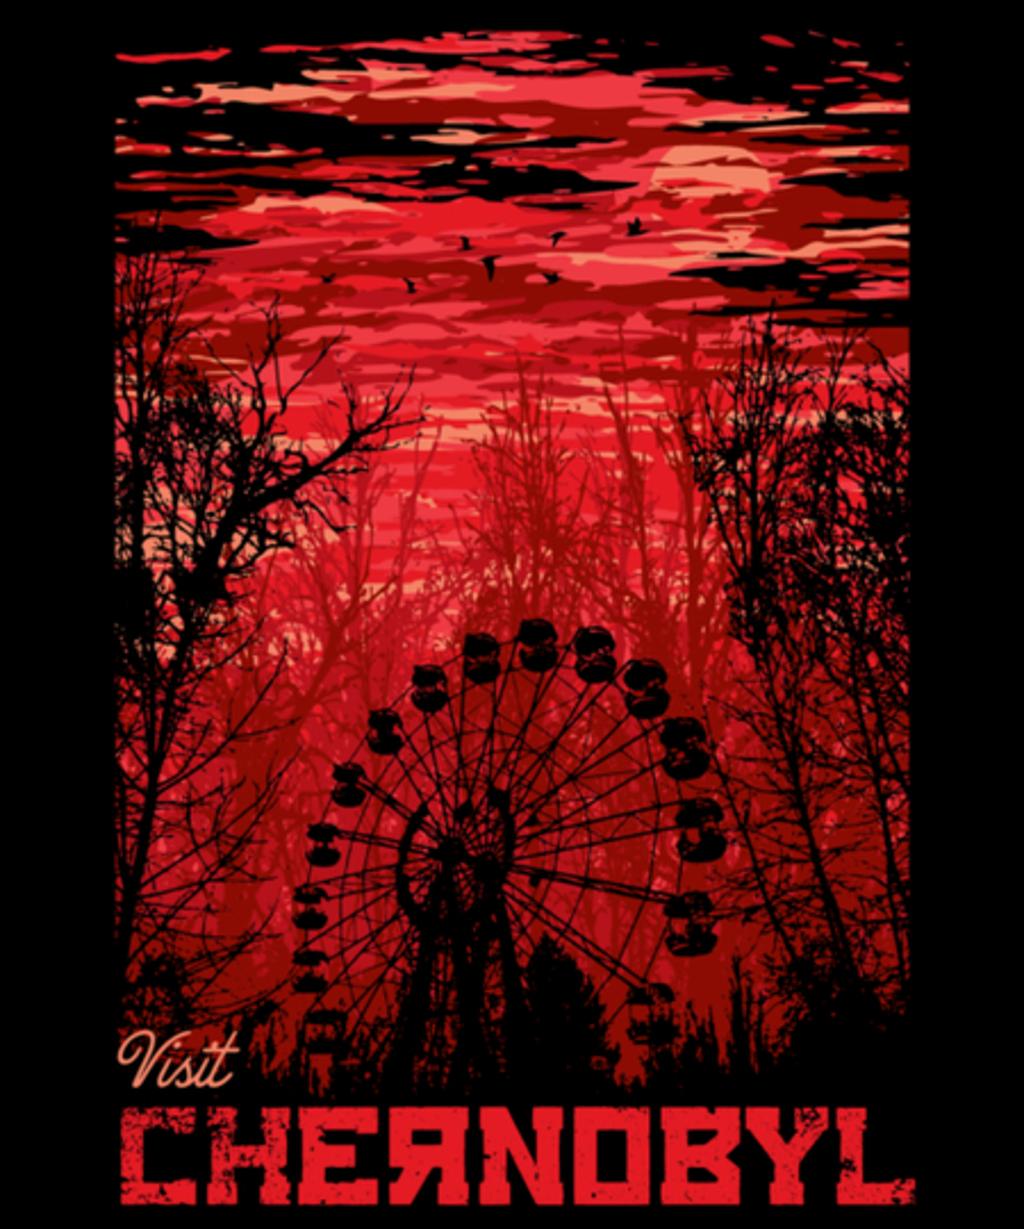 Qwertee: Visit Chernobyl